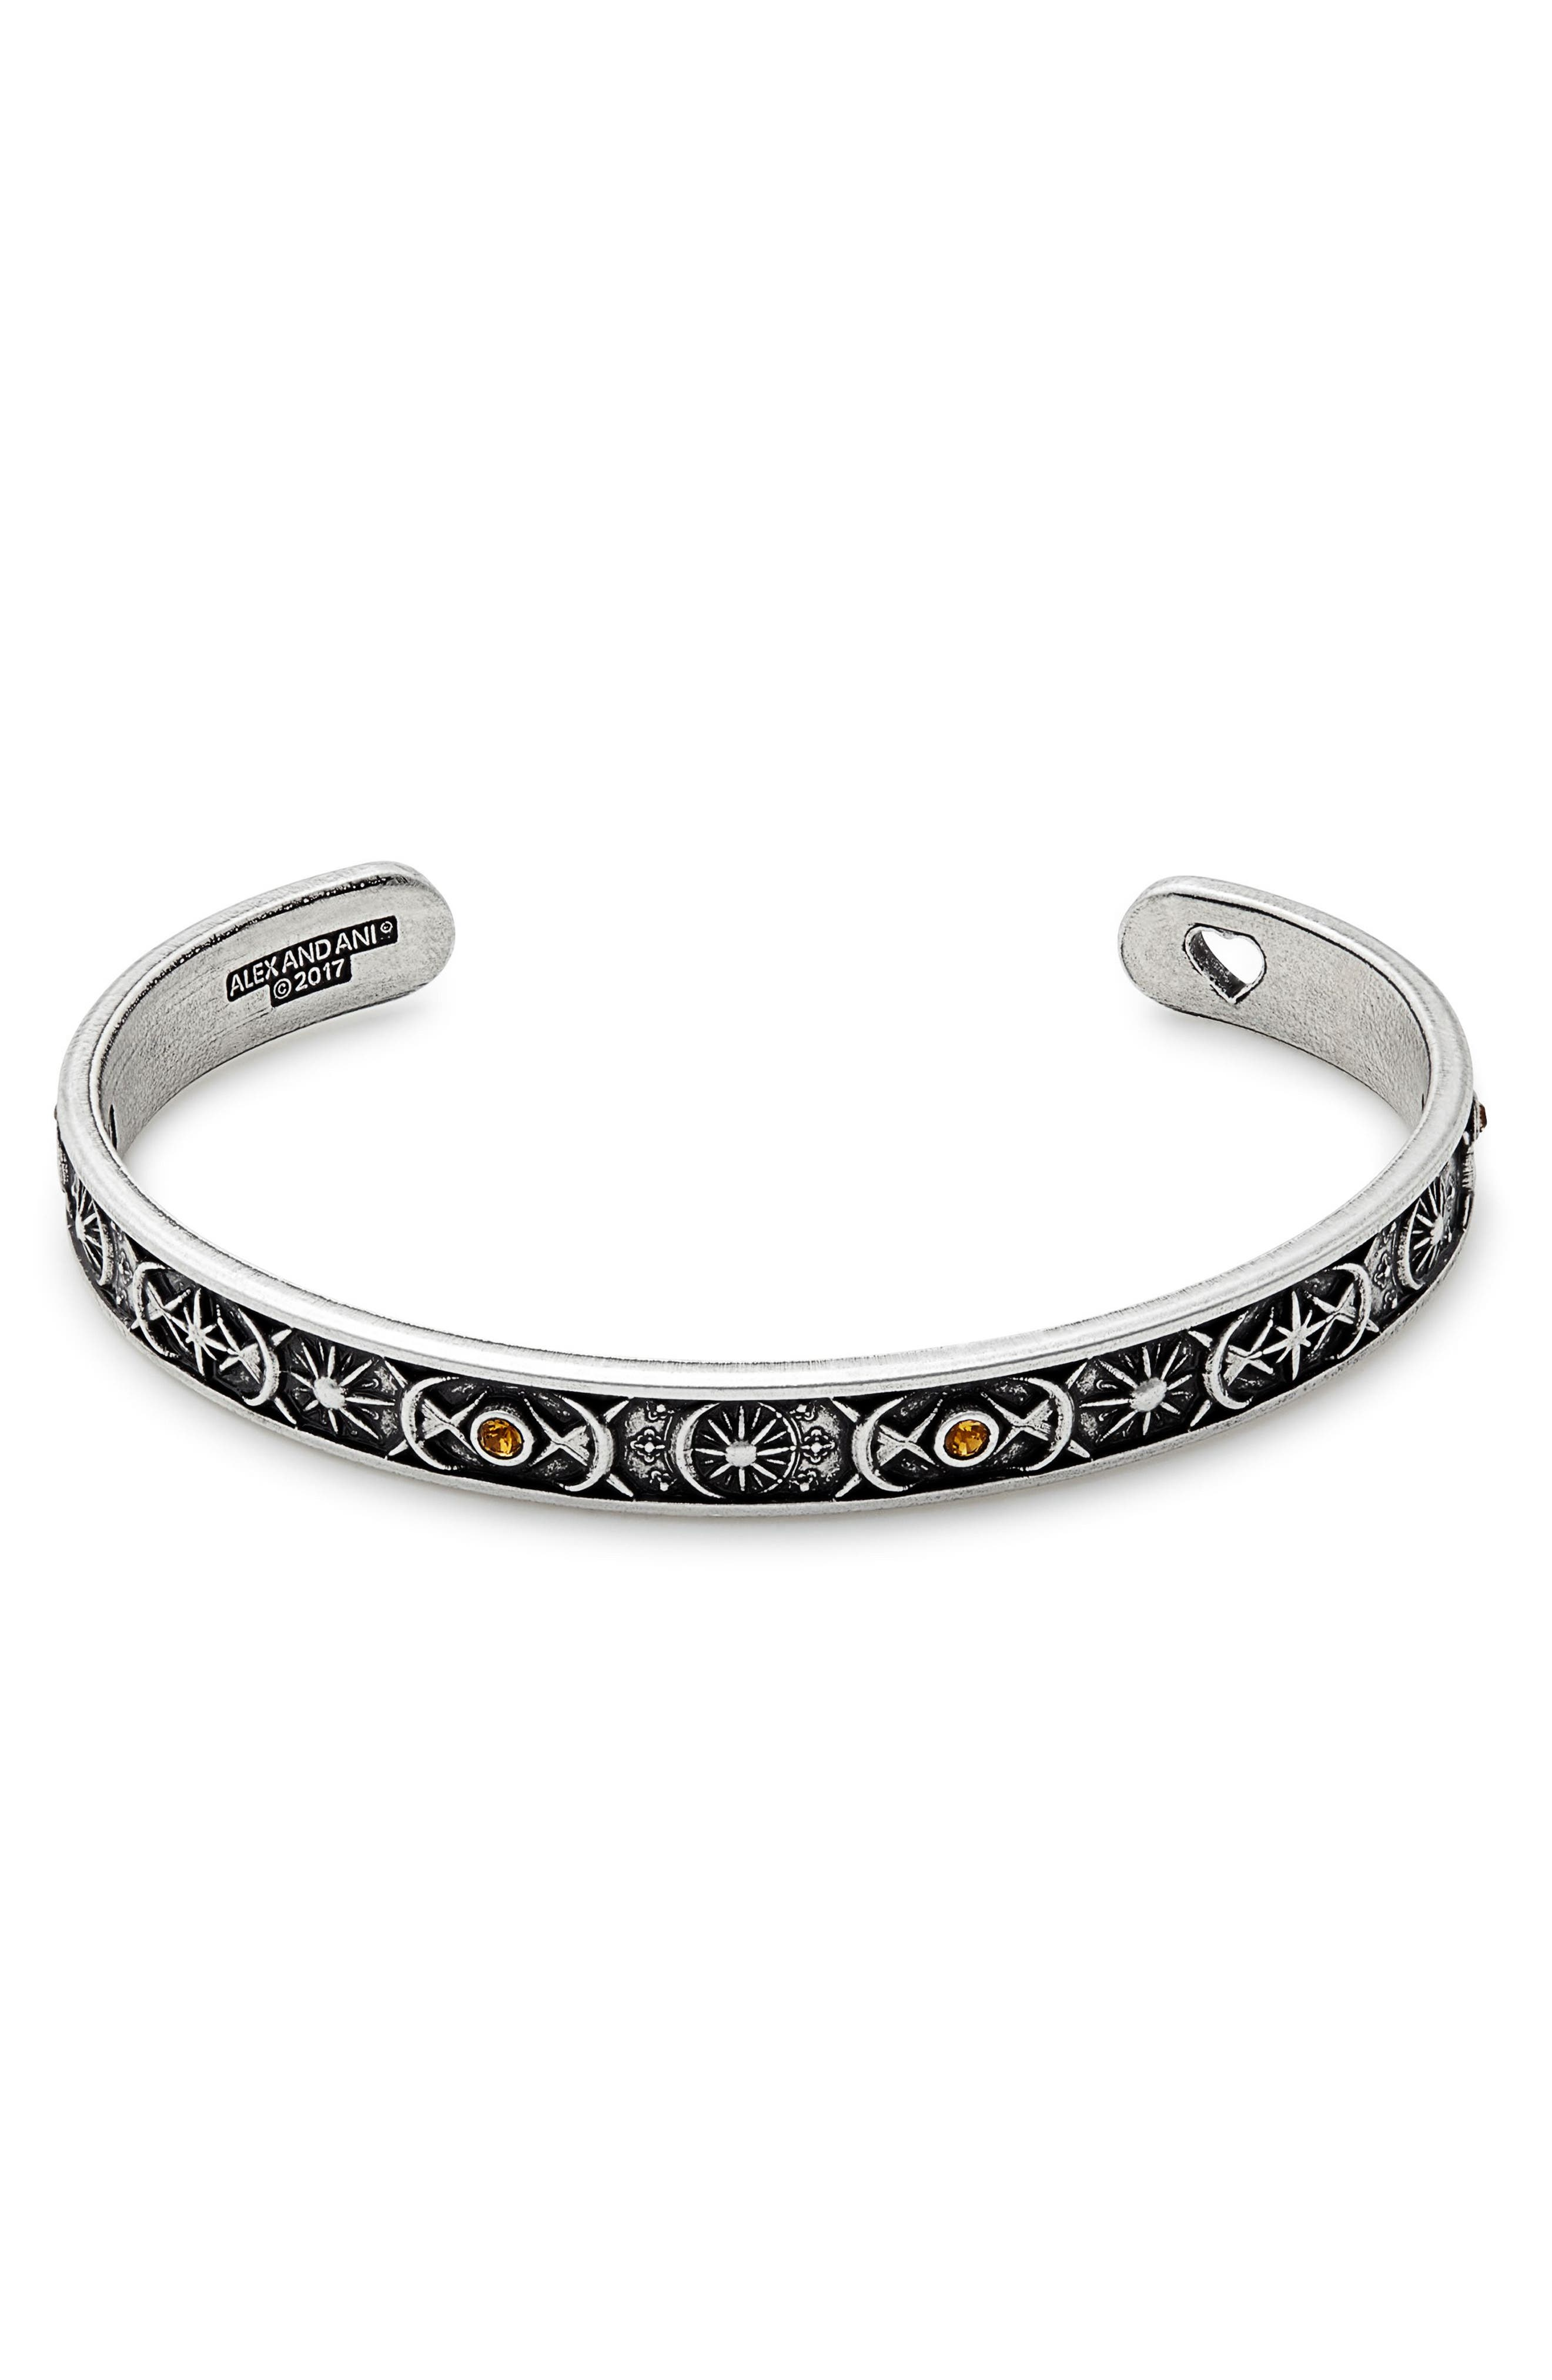 Cosmic Balance Cuff,                         Main,                         color, Silver